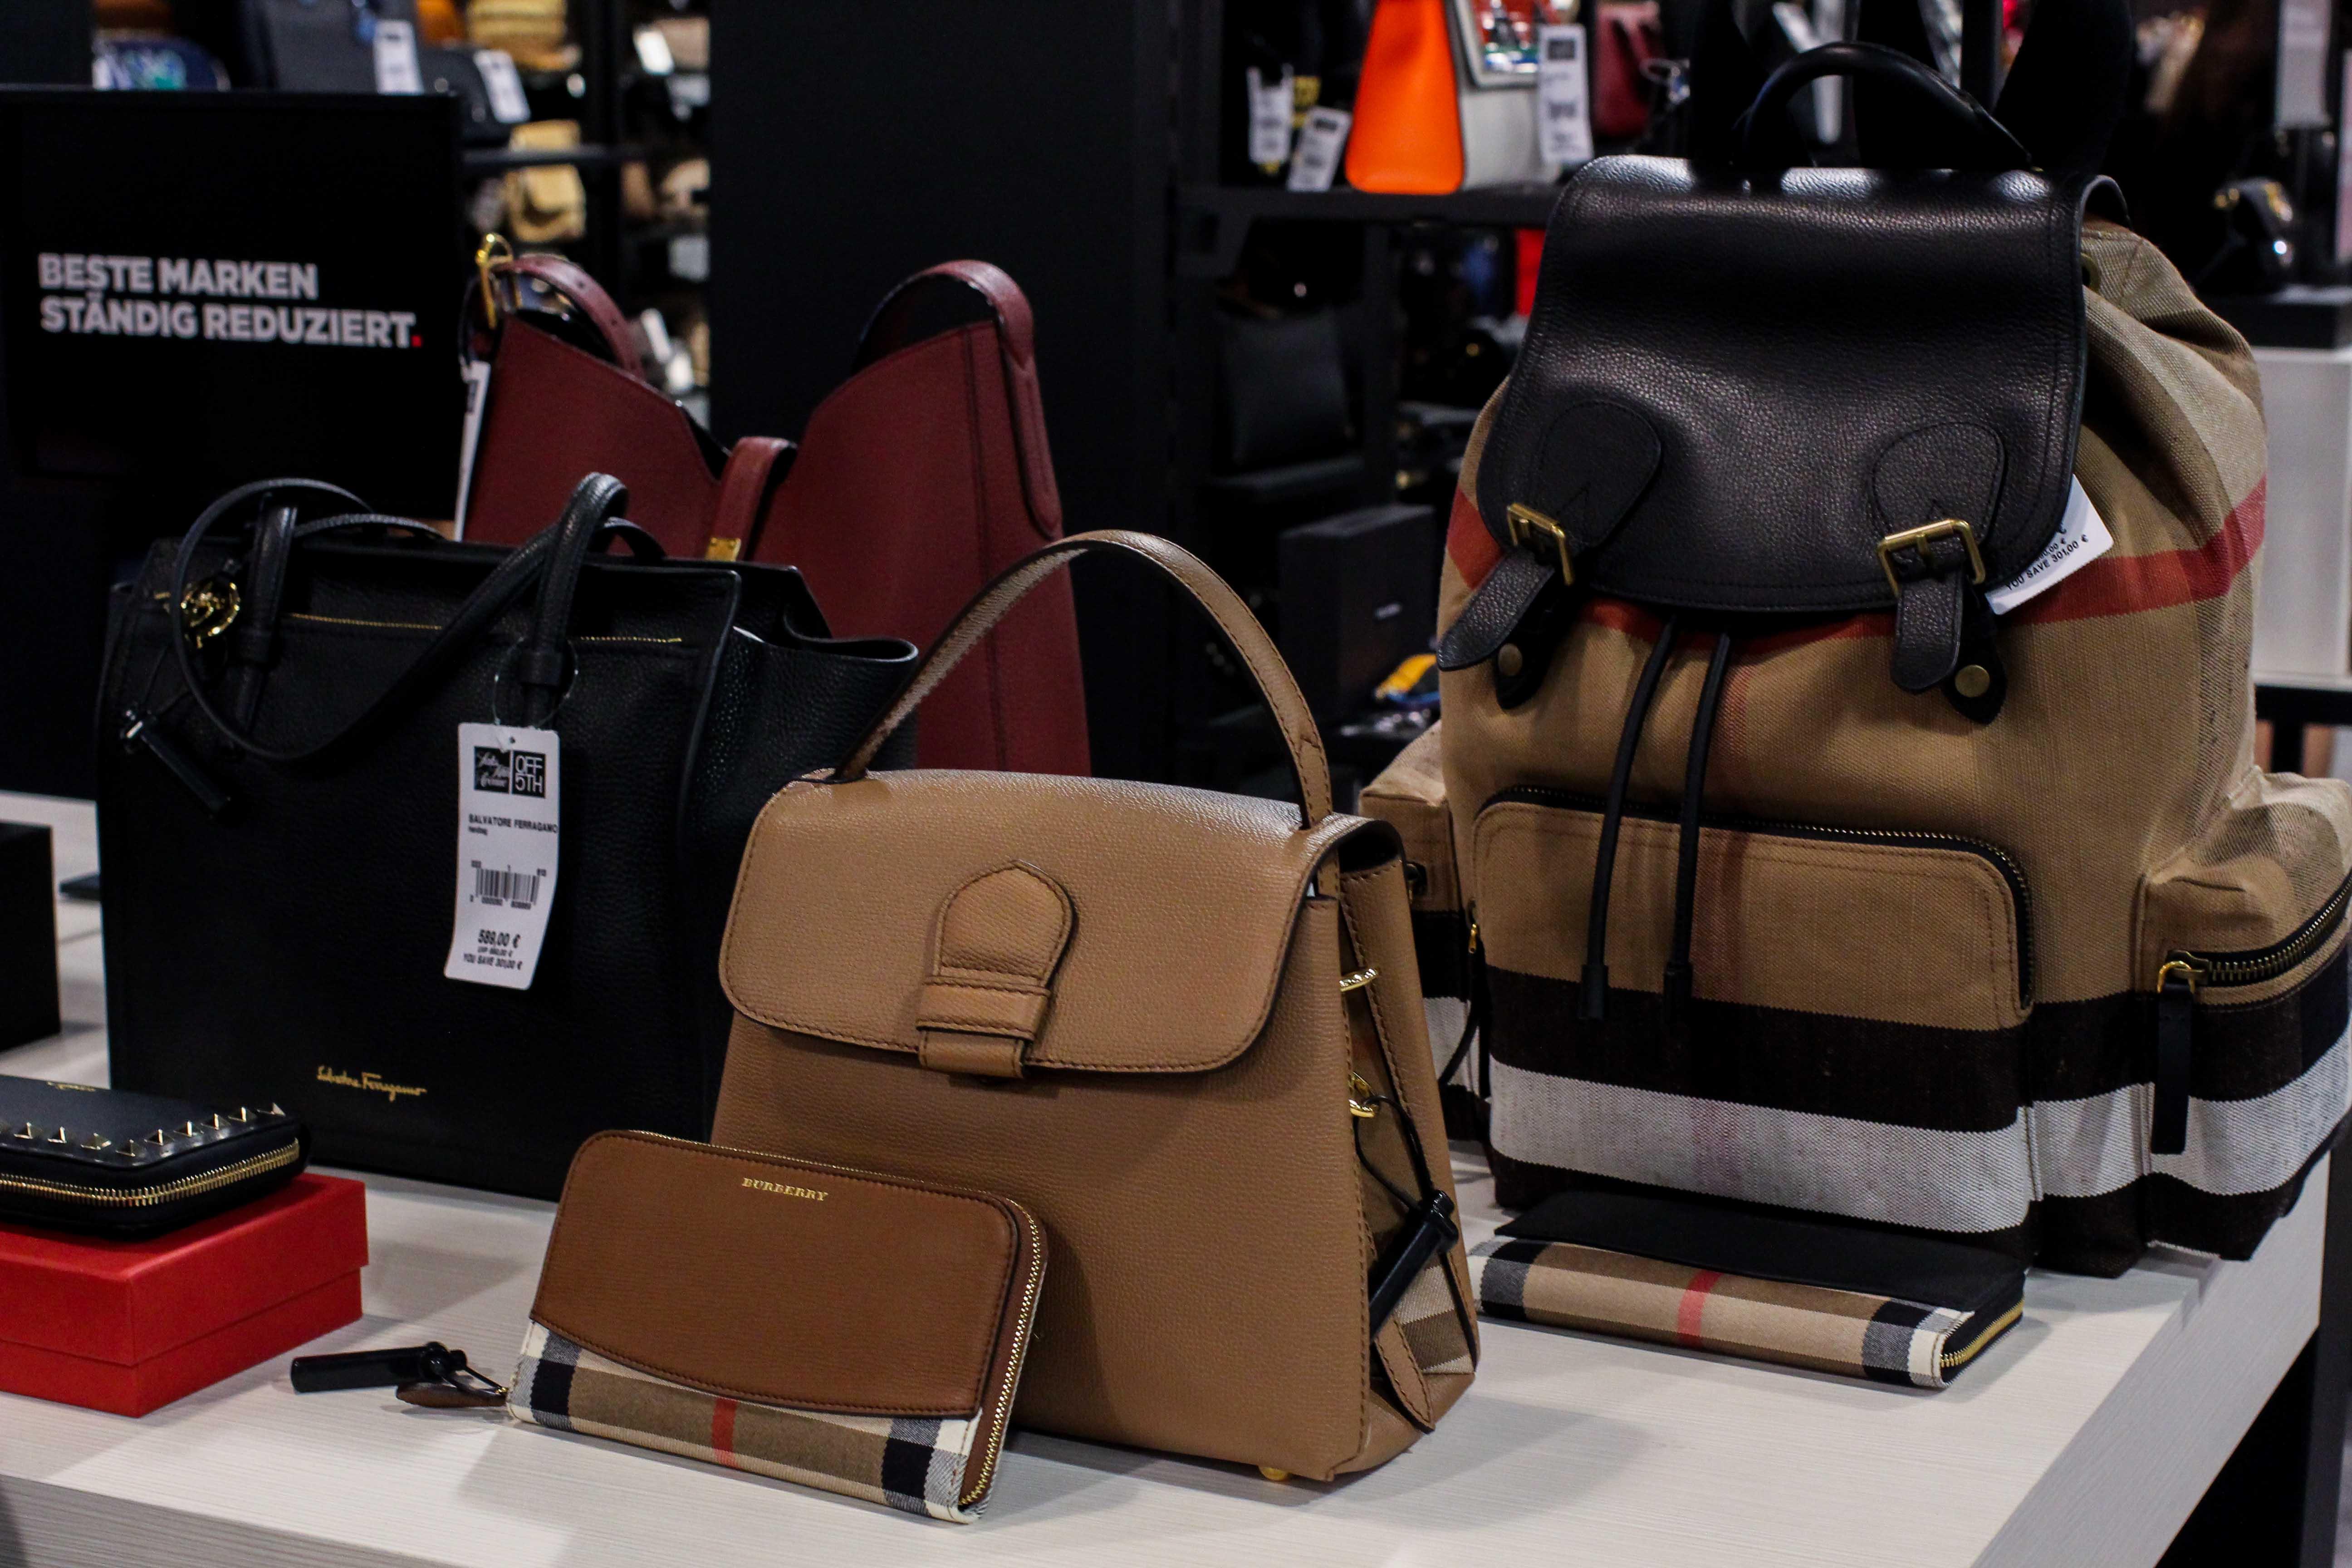 Burberry Taschen Rucksack Store Opening Saks OFF 5th Avenue Bonn Premium-Marken Outletpreis Designer Outlet Bonn Modeblog